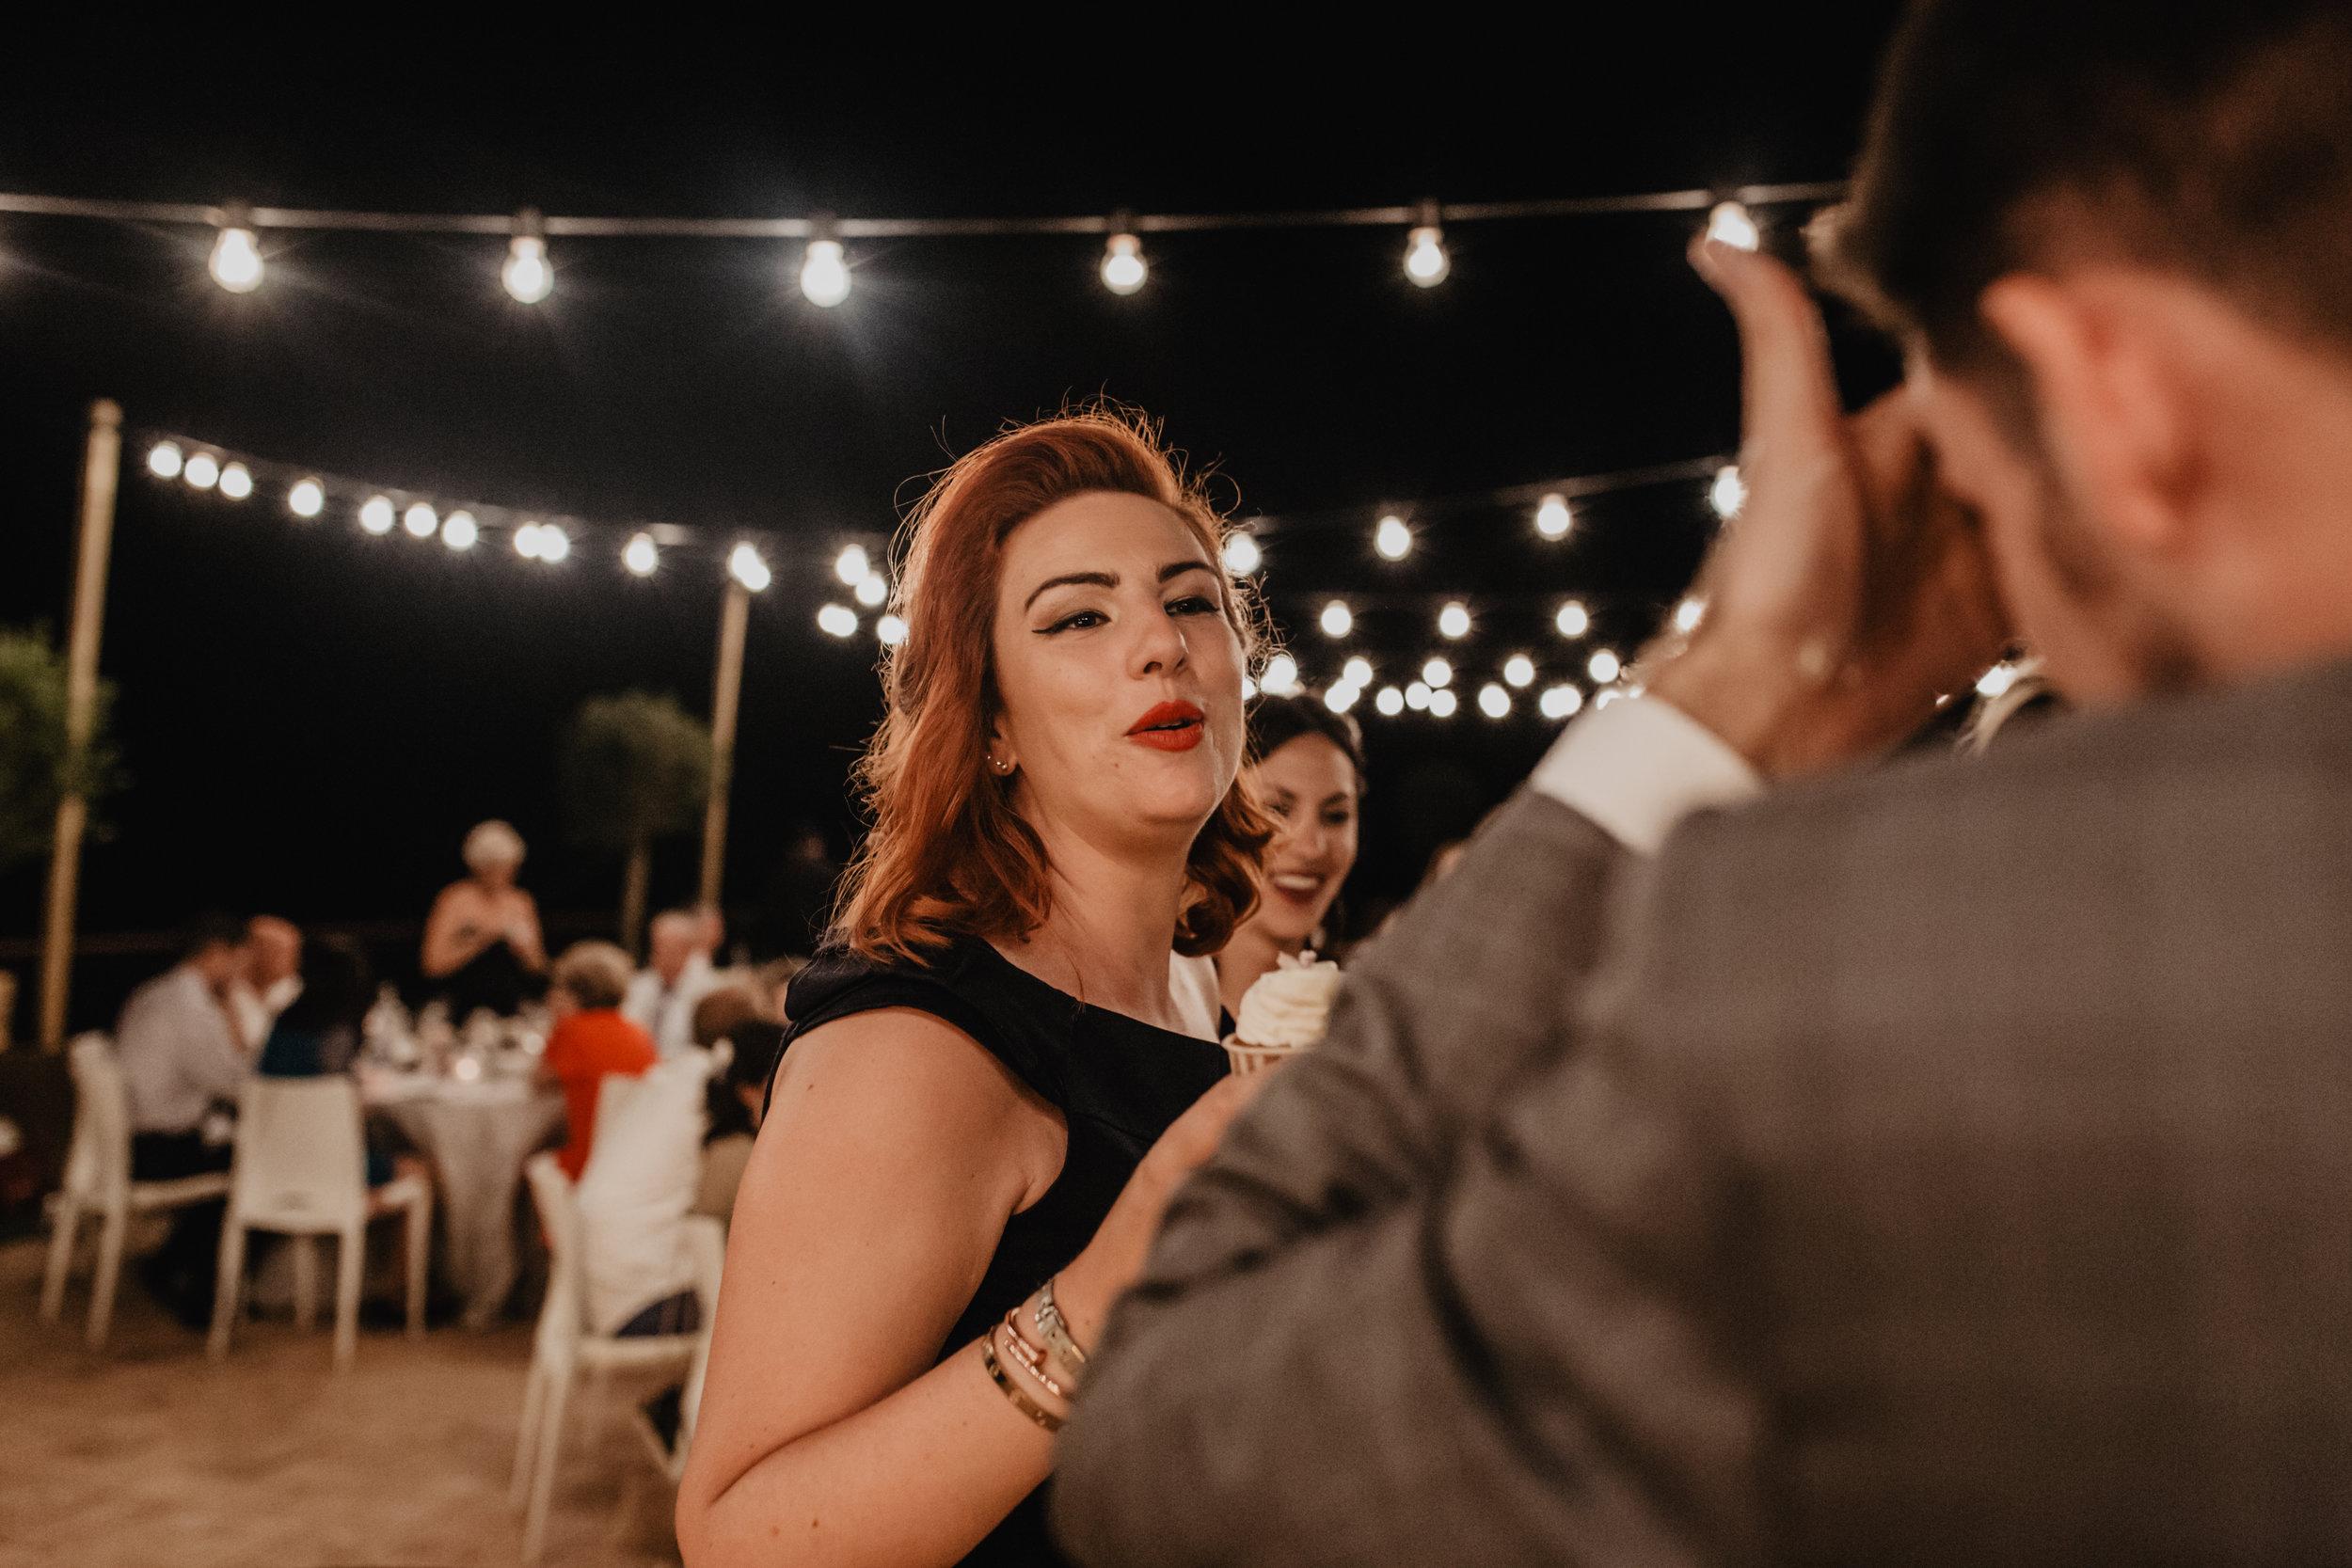 thenortherngirlphotography_photography_thenortherngirl_rebeccascabros_wedding_weddingphotography_masialagarrigadecastelladral_joaniemma_bodaenbarcelona_weddingphotographer_emmaijoan-940.jpg